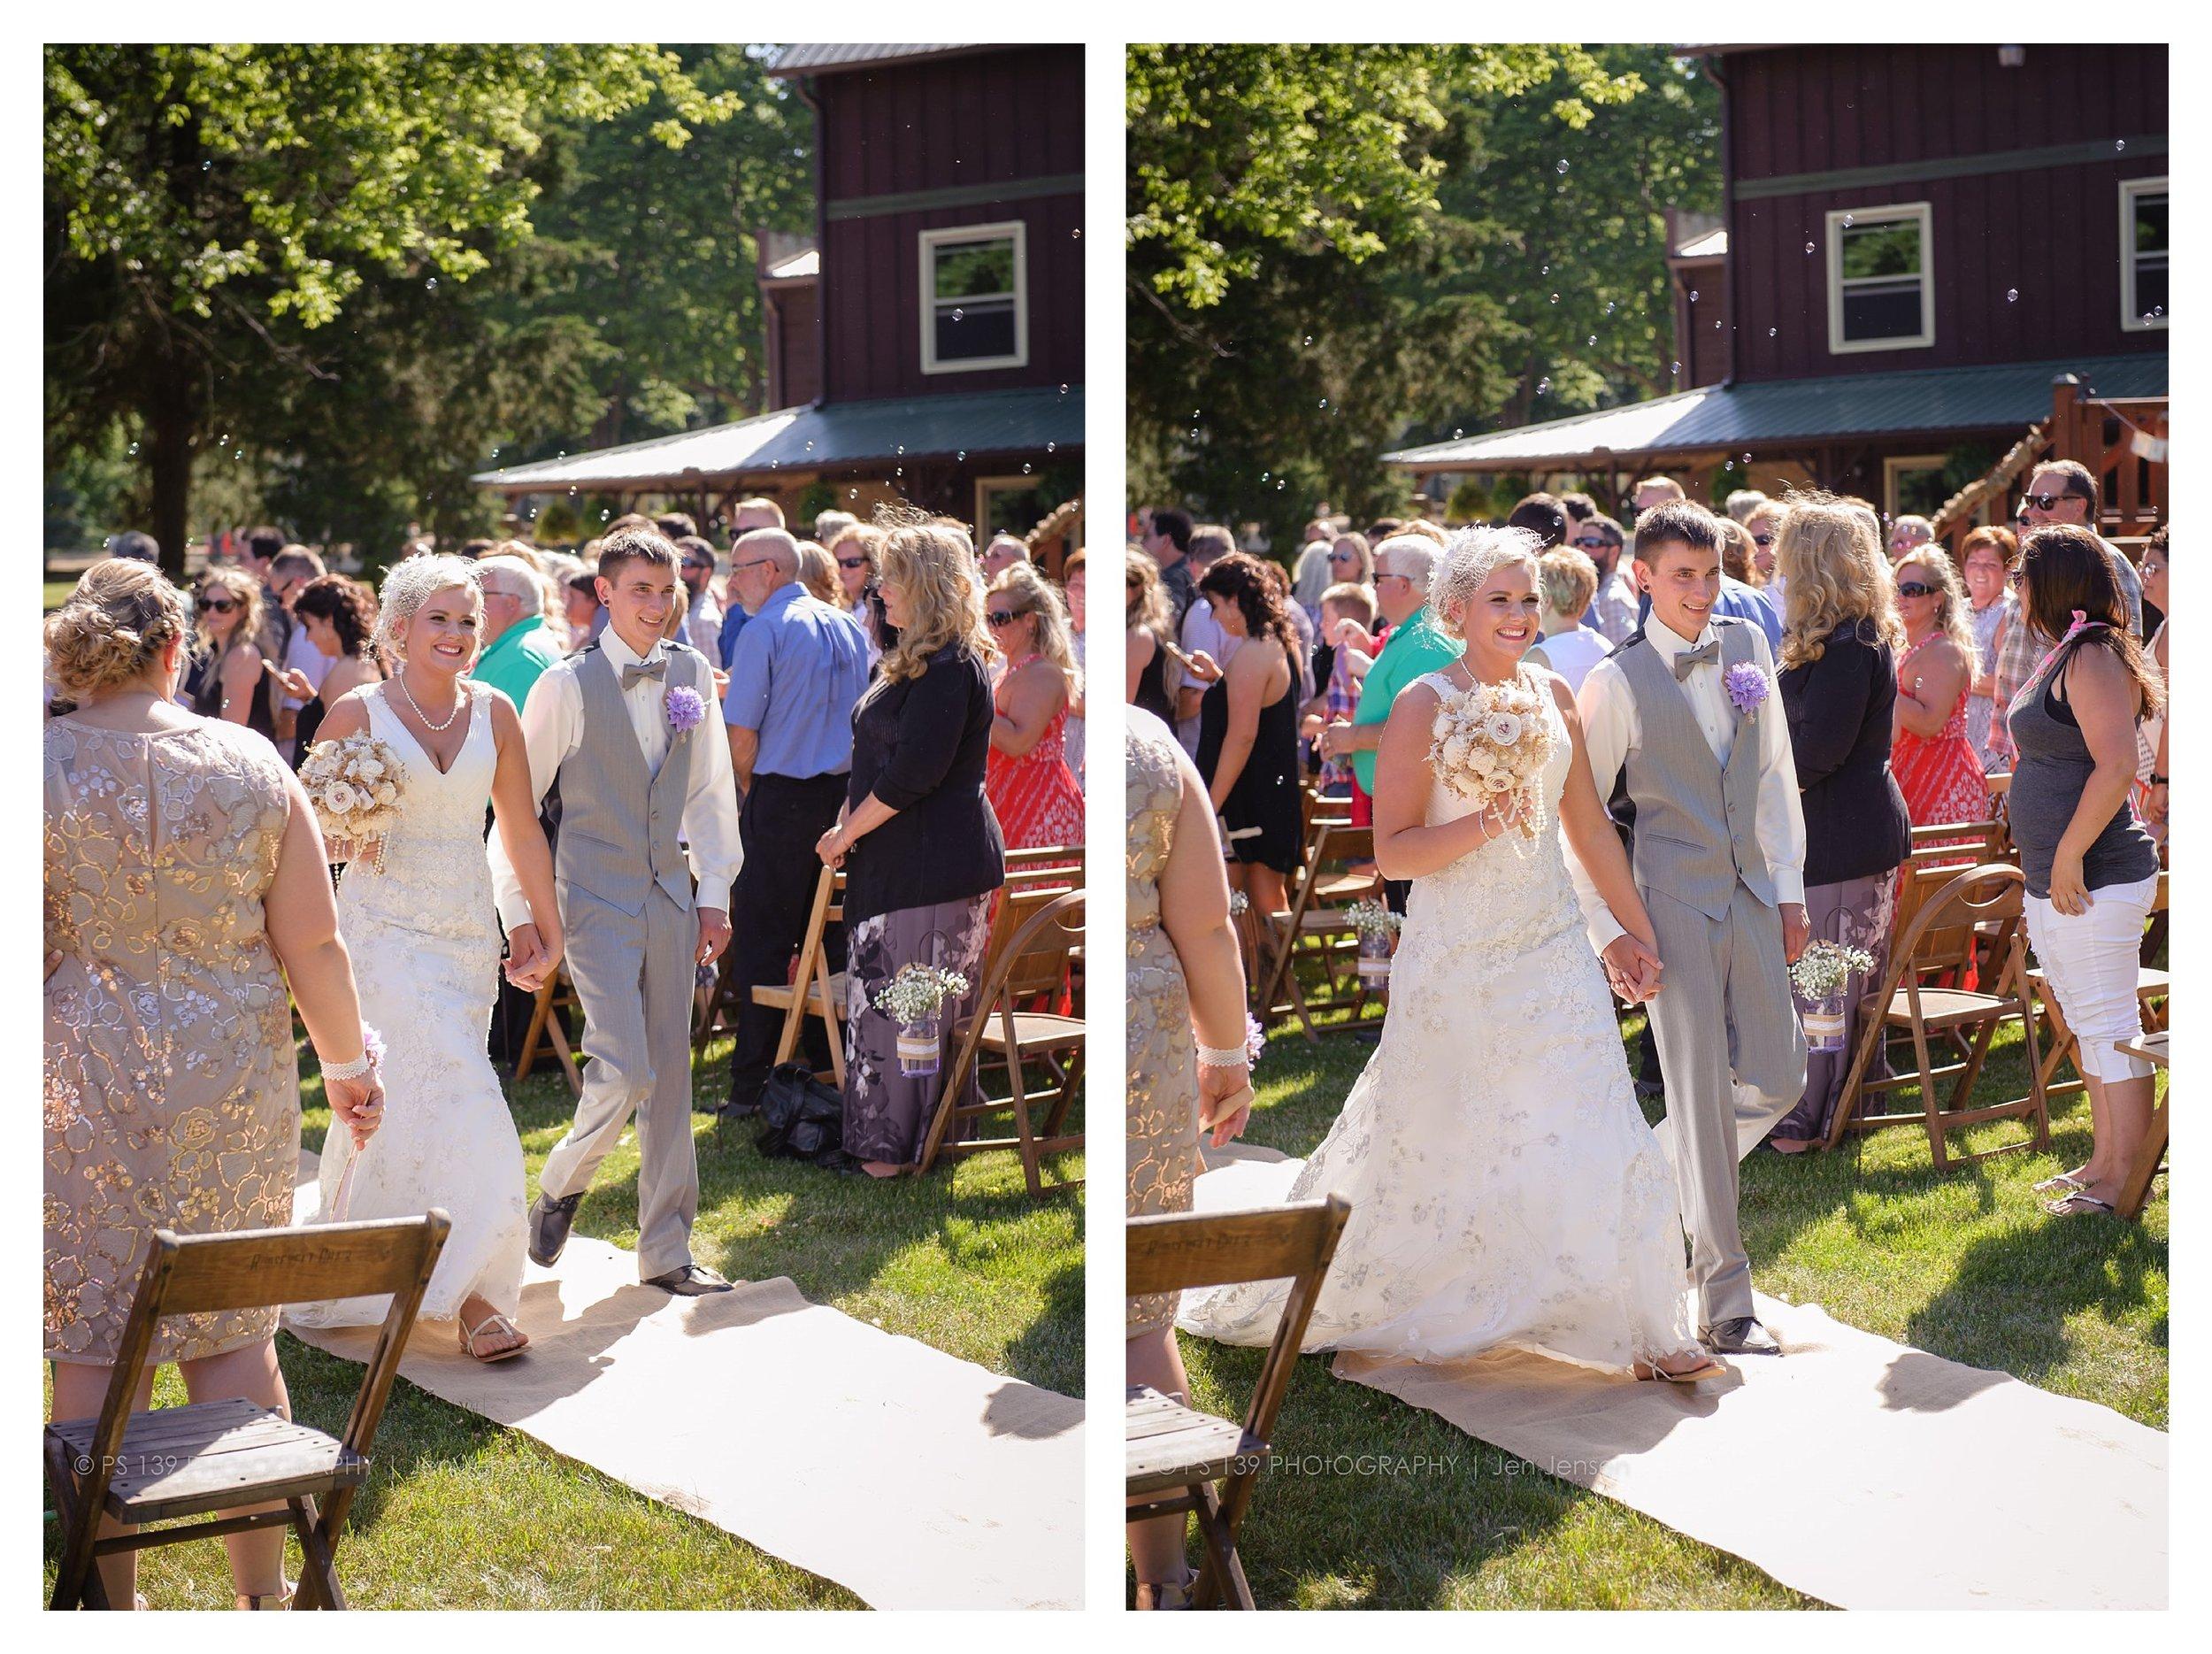 oregon Illinois oak lane farm wisconsin wedding photographer bayfield wi ps 139 photography jen jensen_0261.jpg